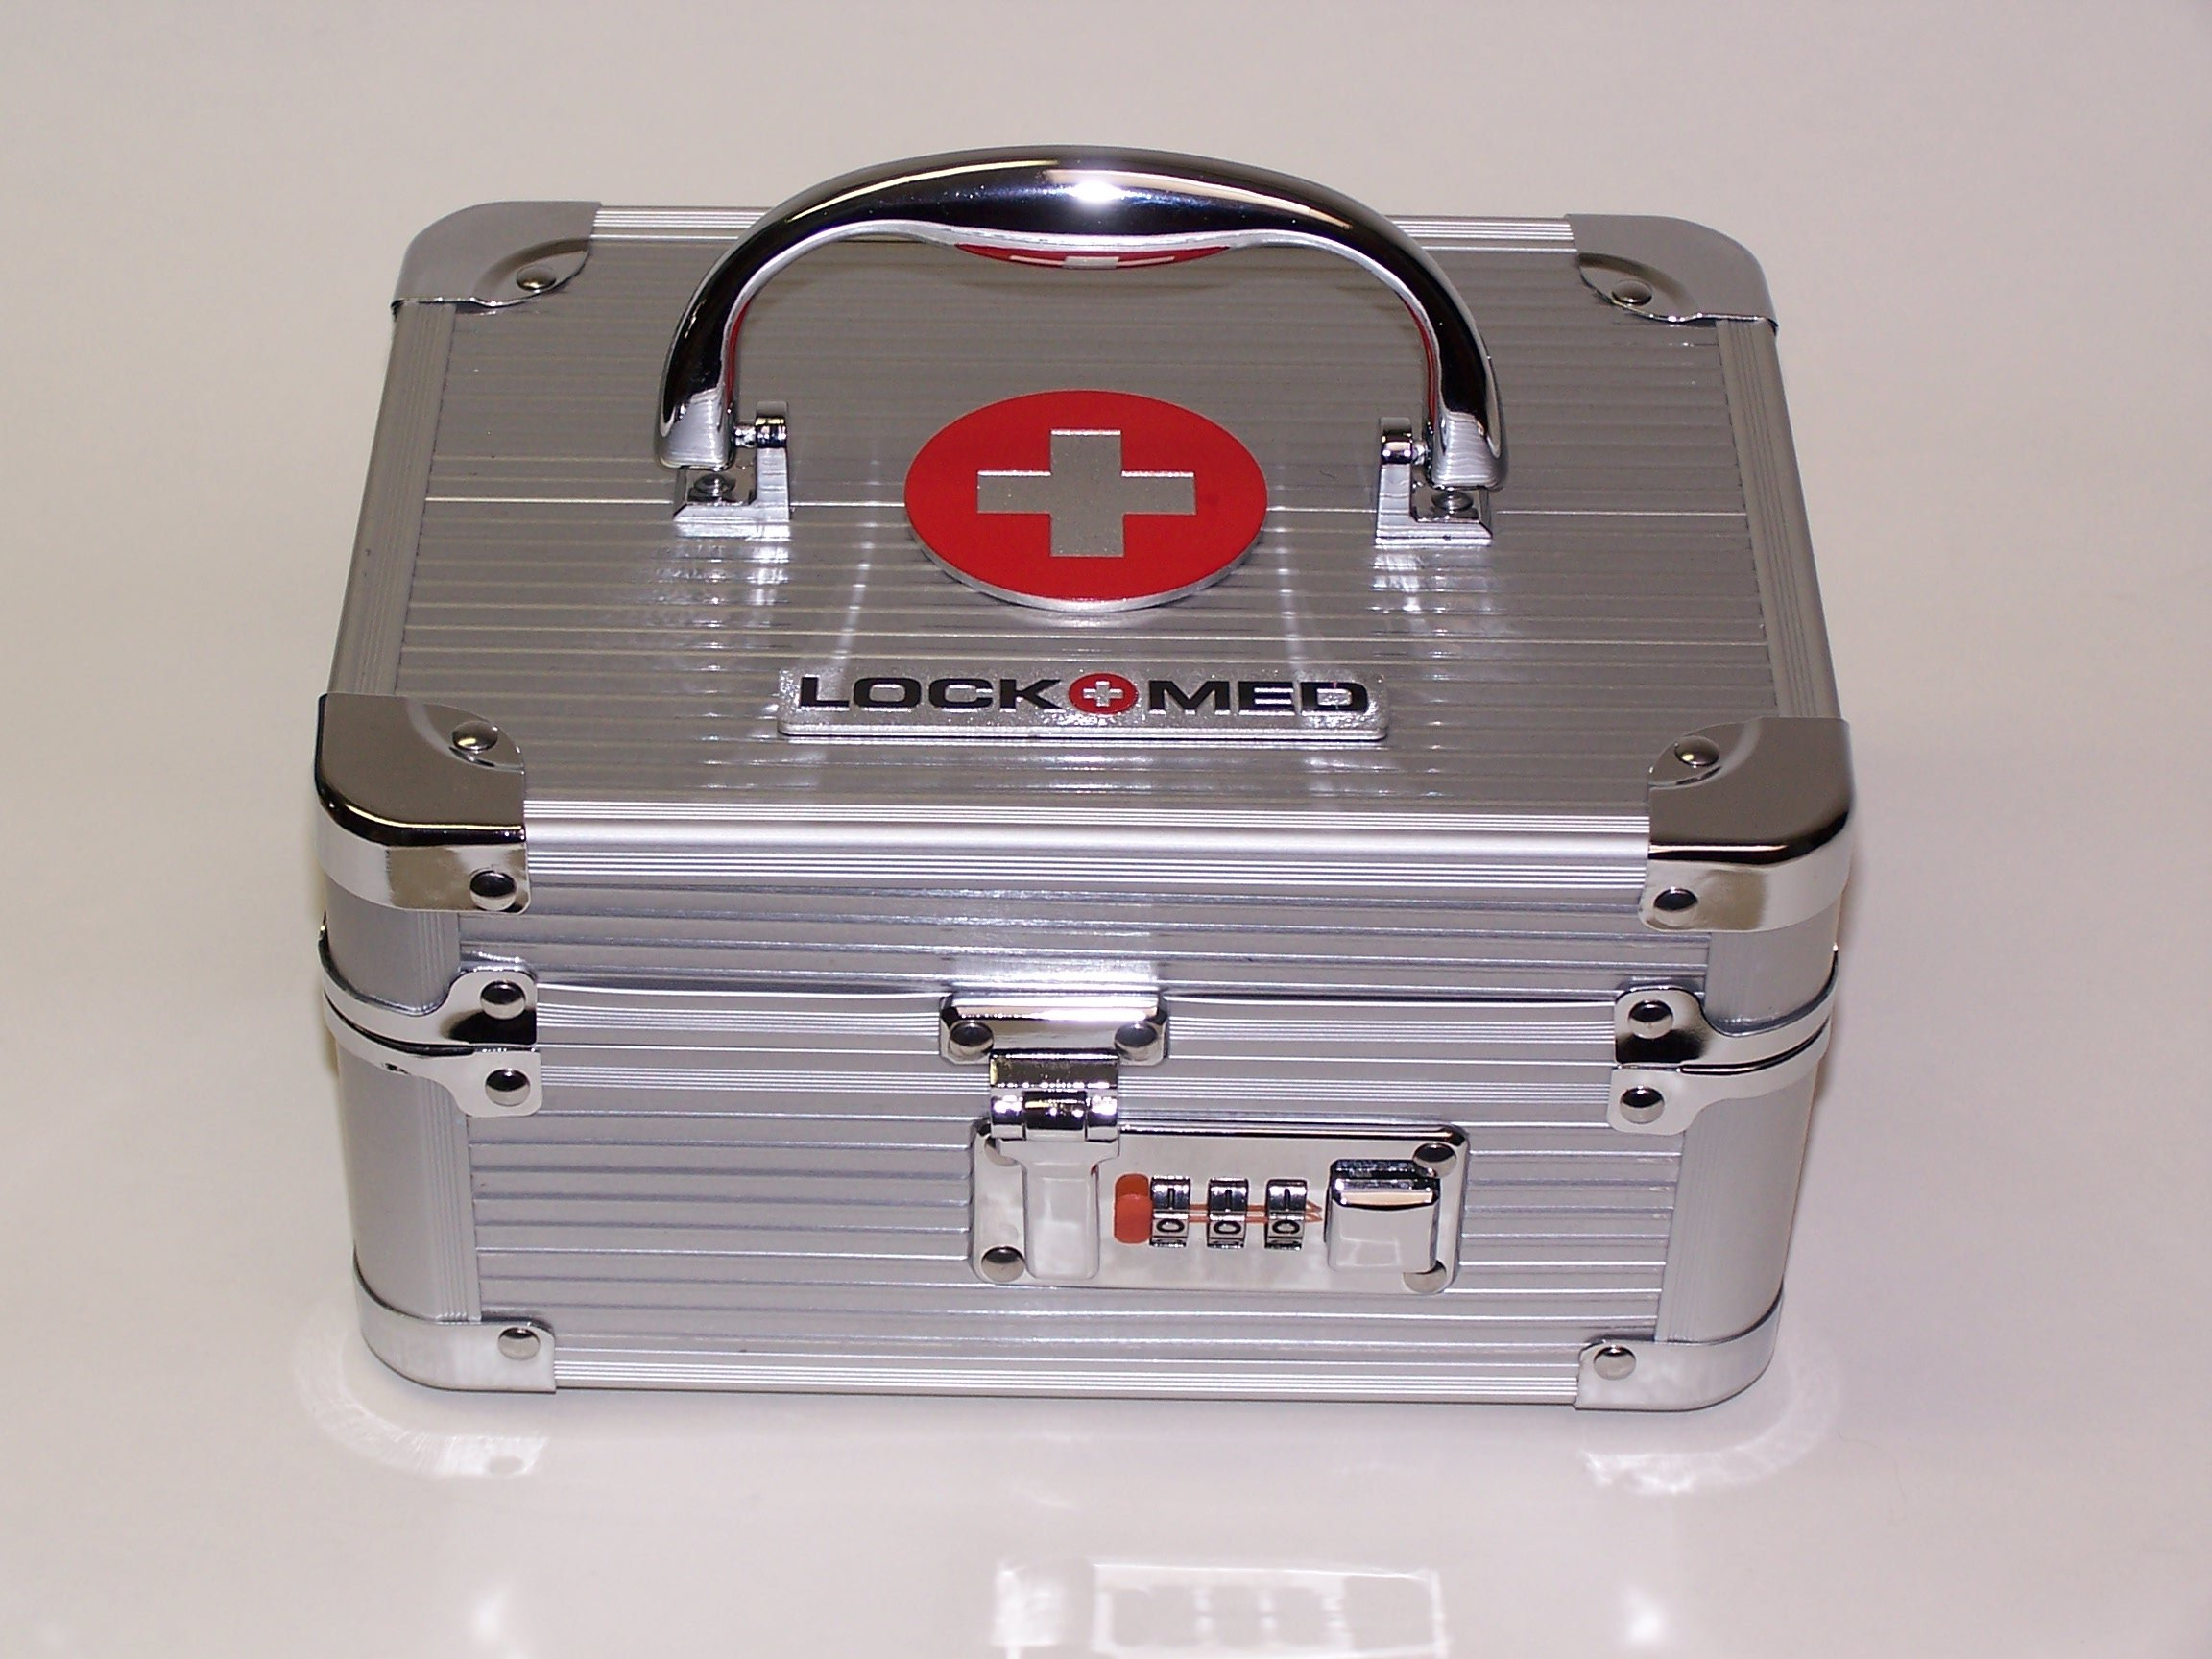 Medication Lock Box by LOCKMED Lockbox